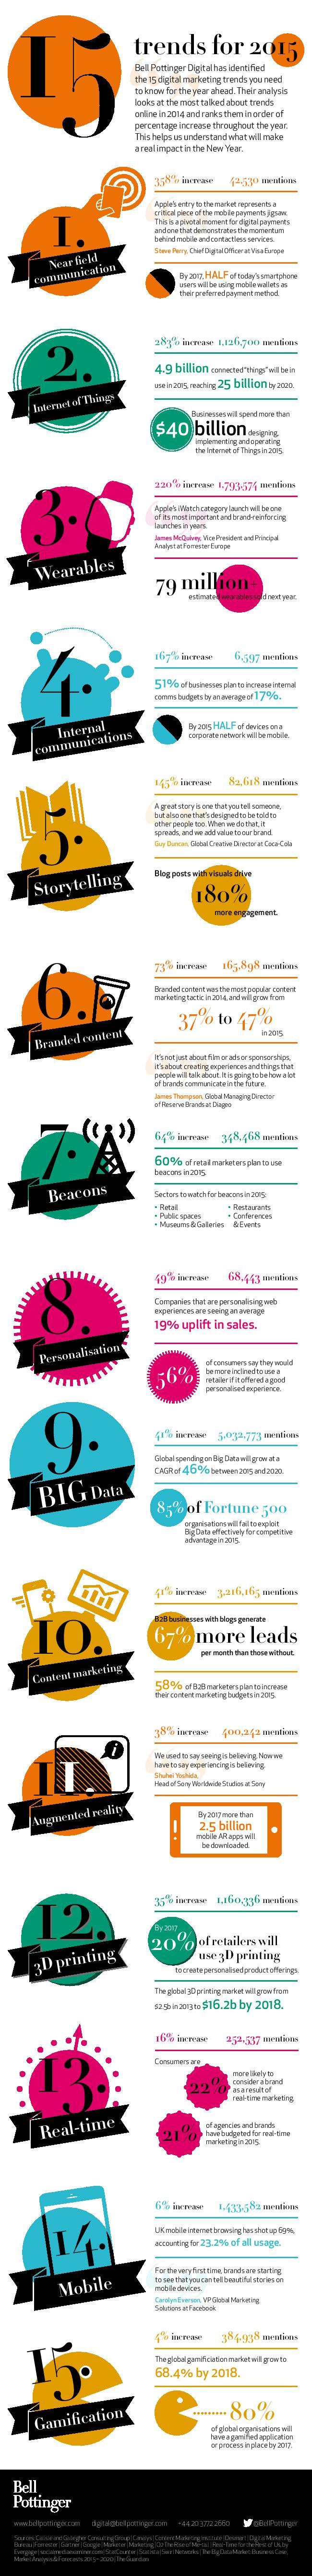 tendances marketing 2015